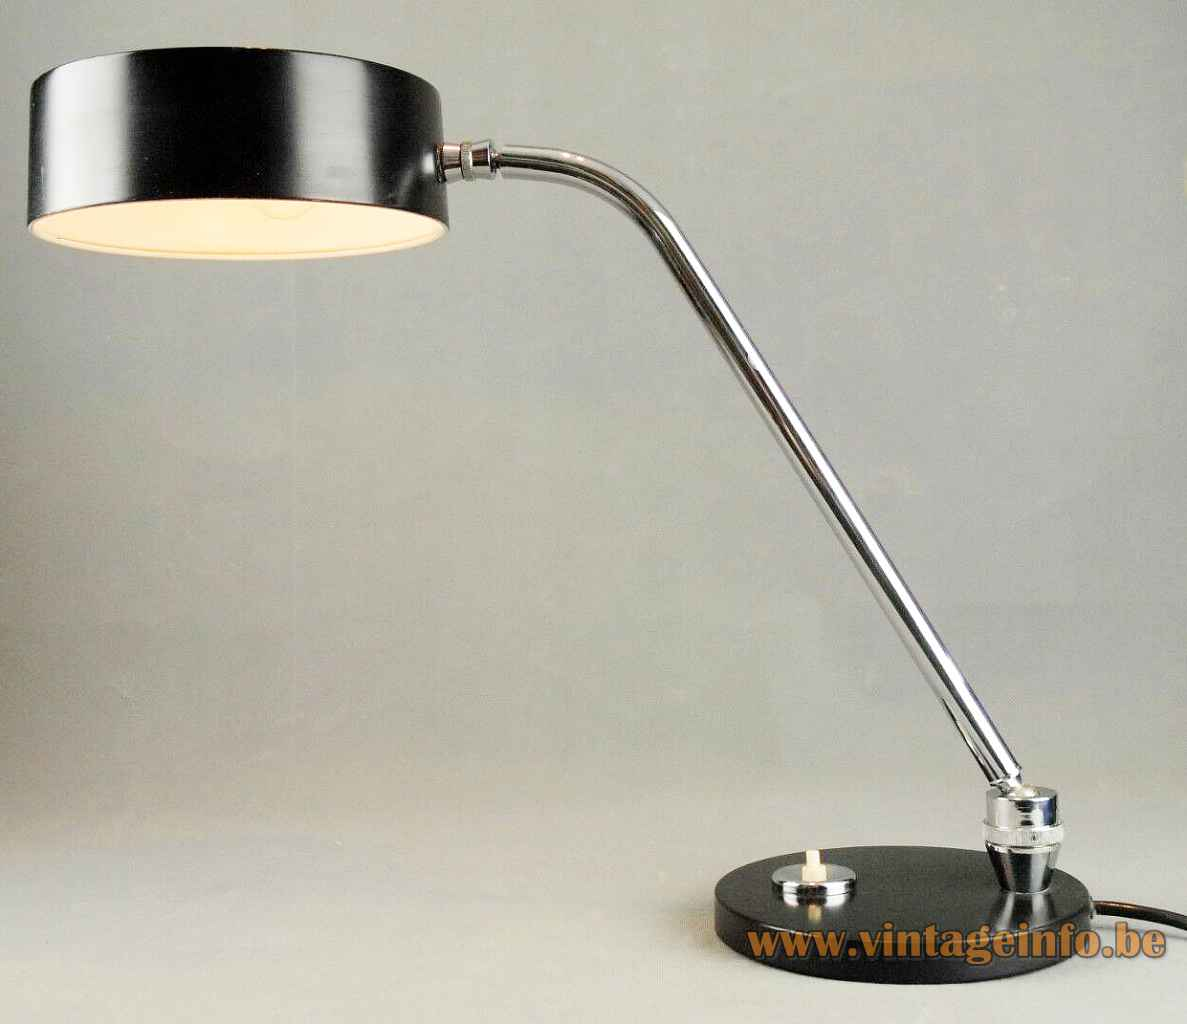 1980s JUMO desk lamp round & flat black metal base adjustable chrome rod disk style lampshade France